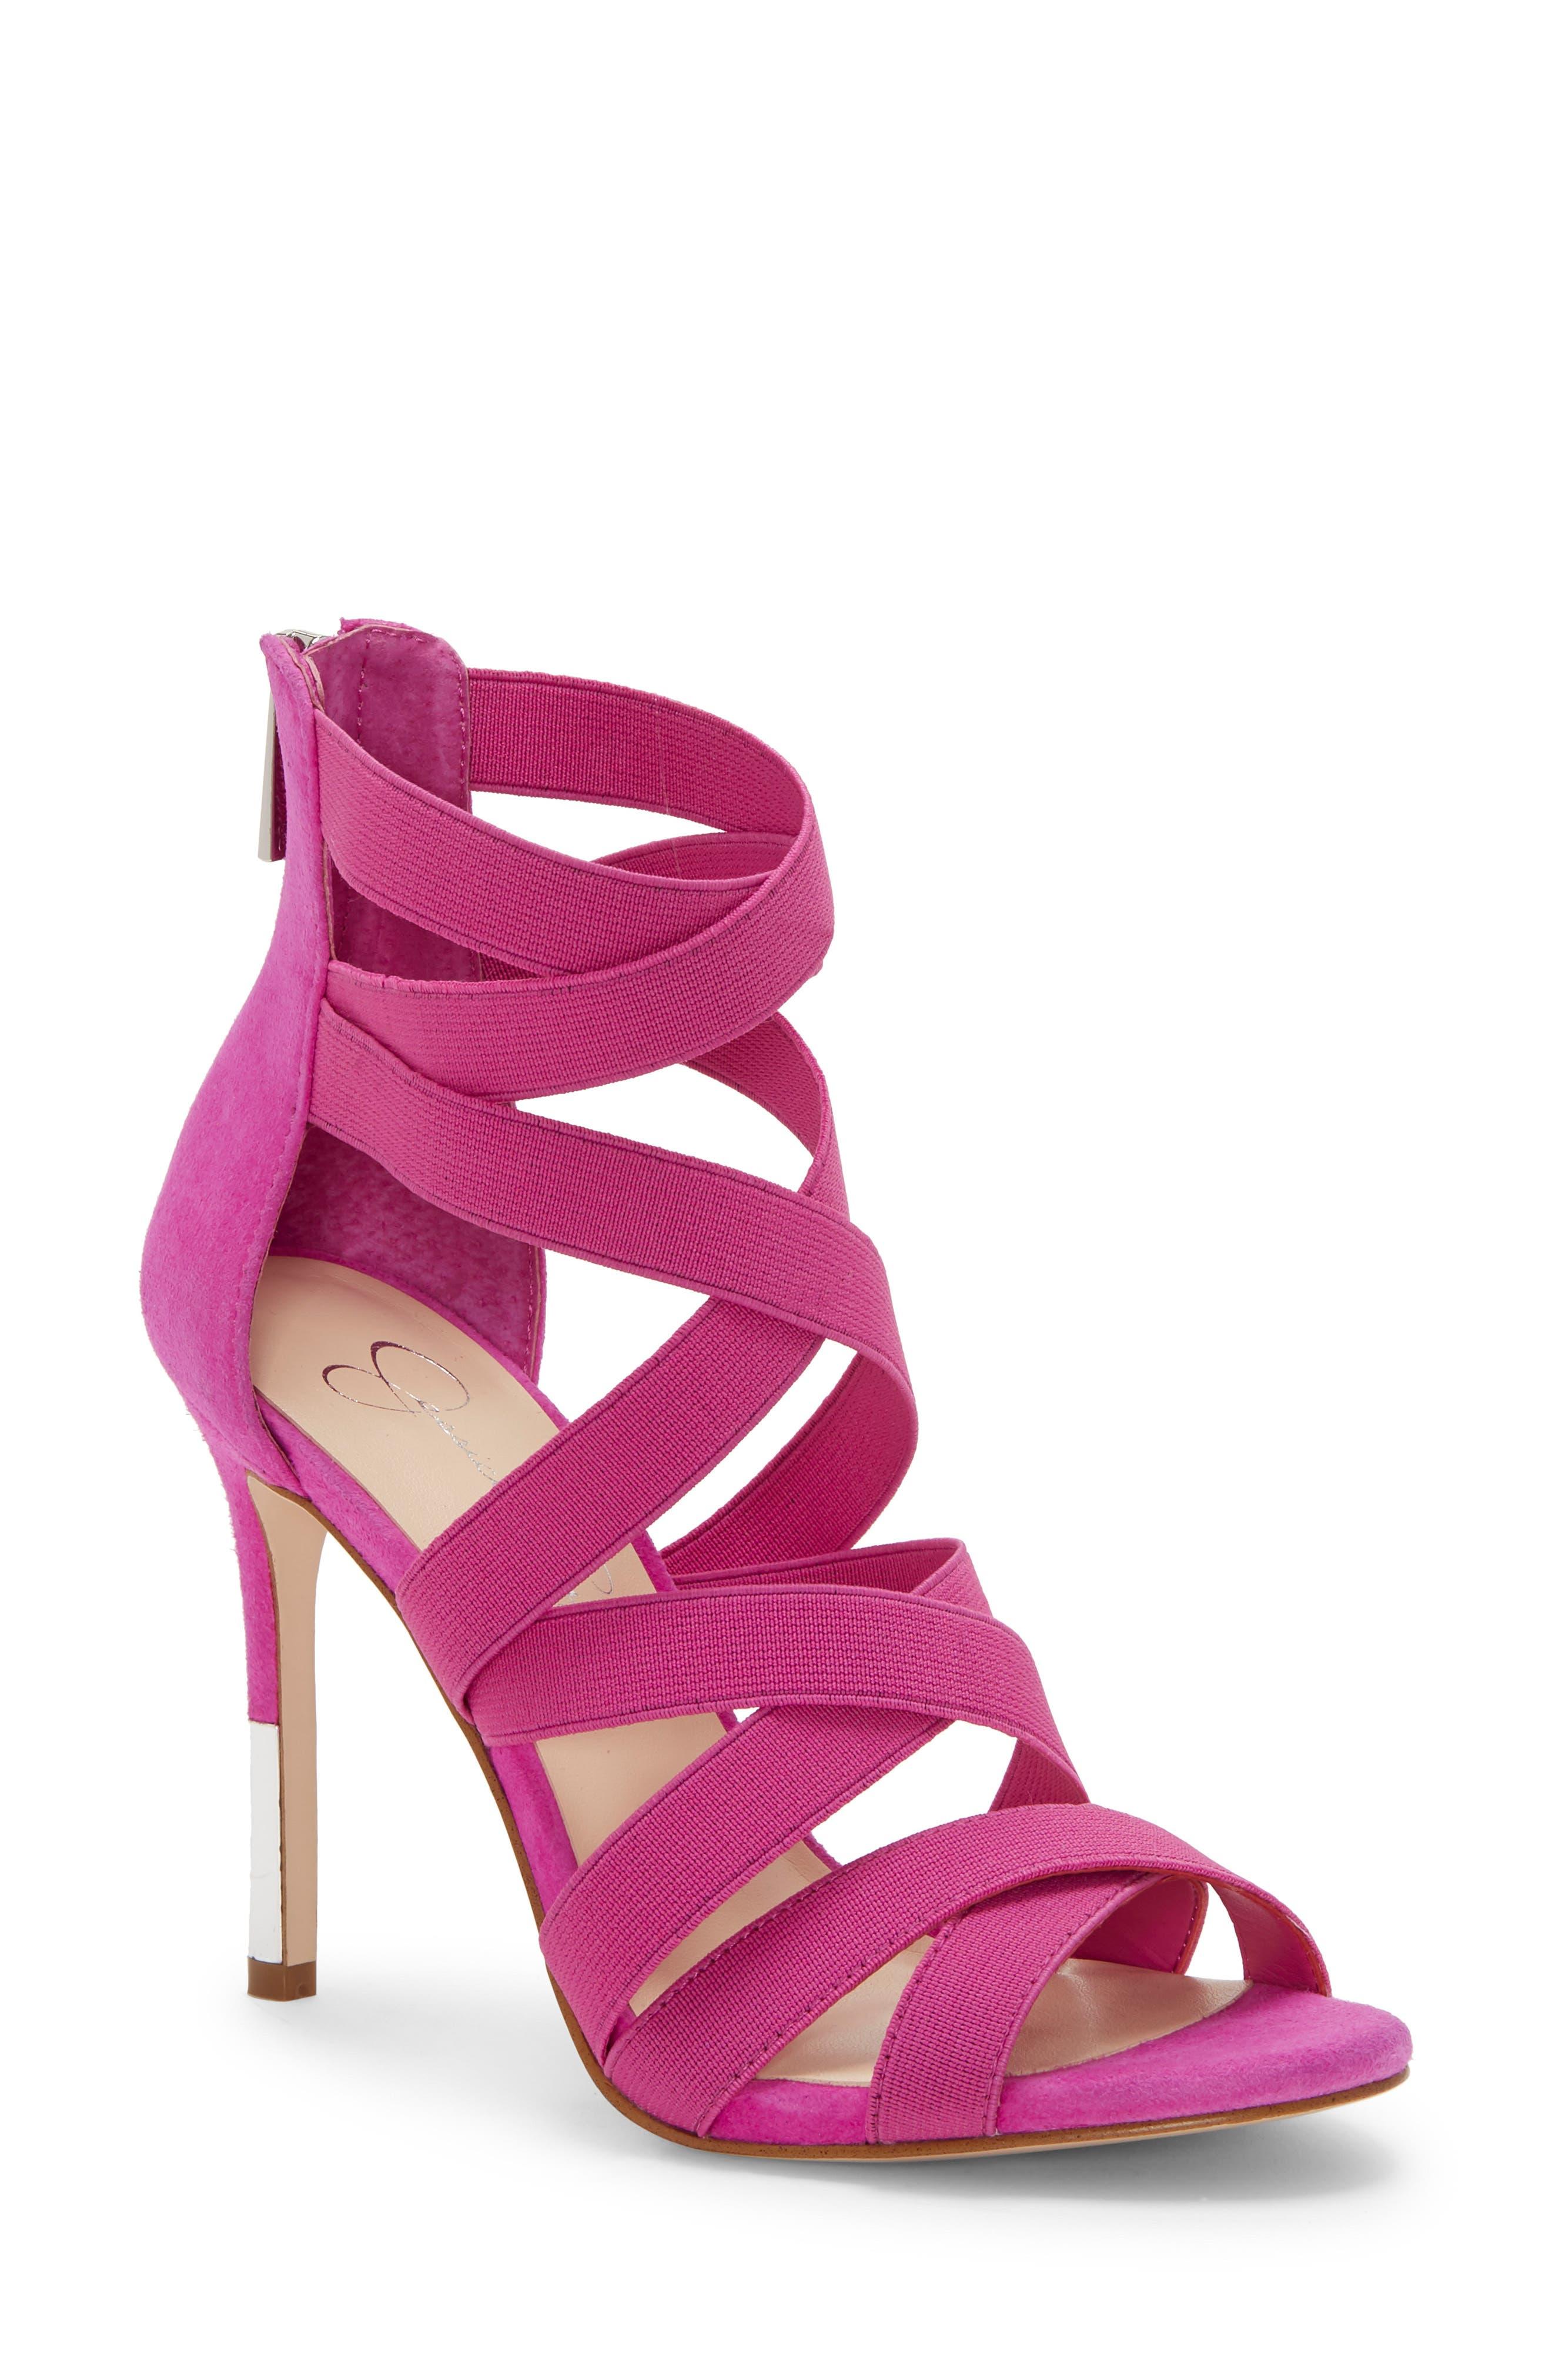 Jessica Simpson Jyra 2 Sandal, Red